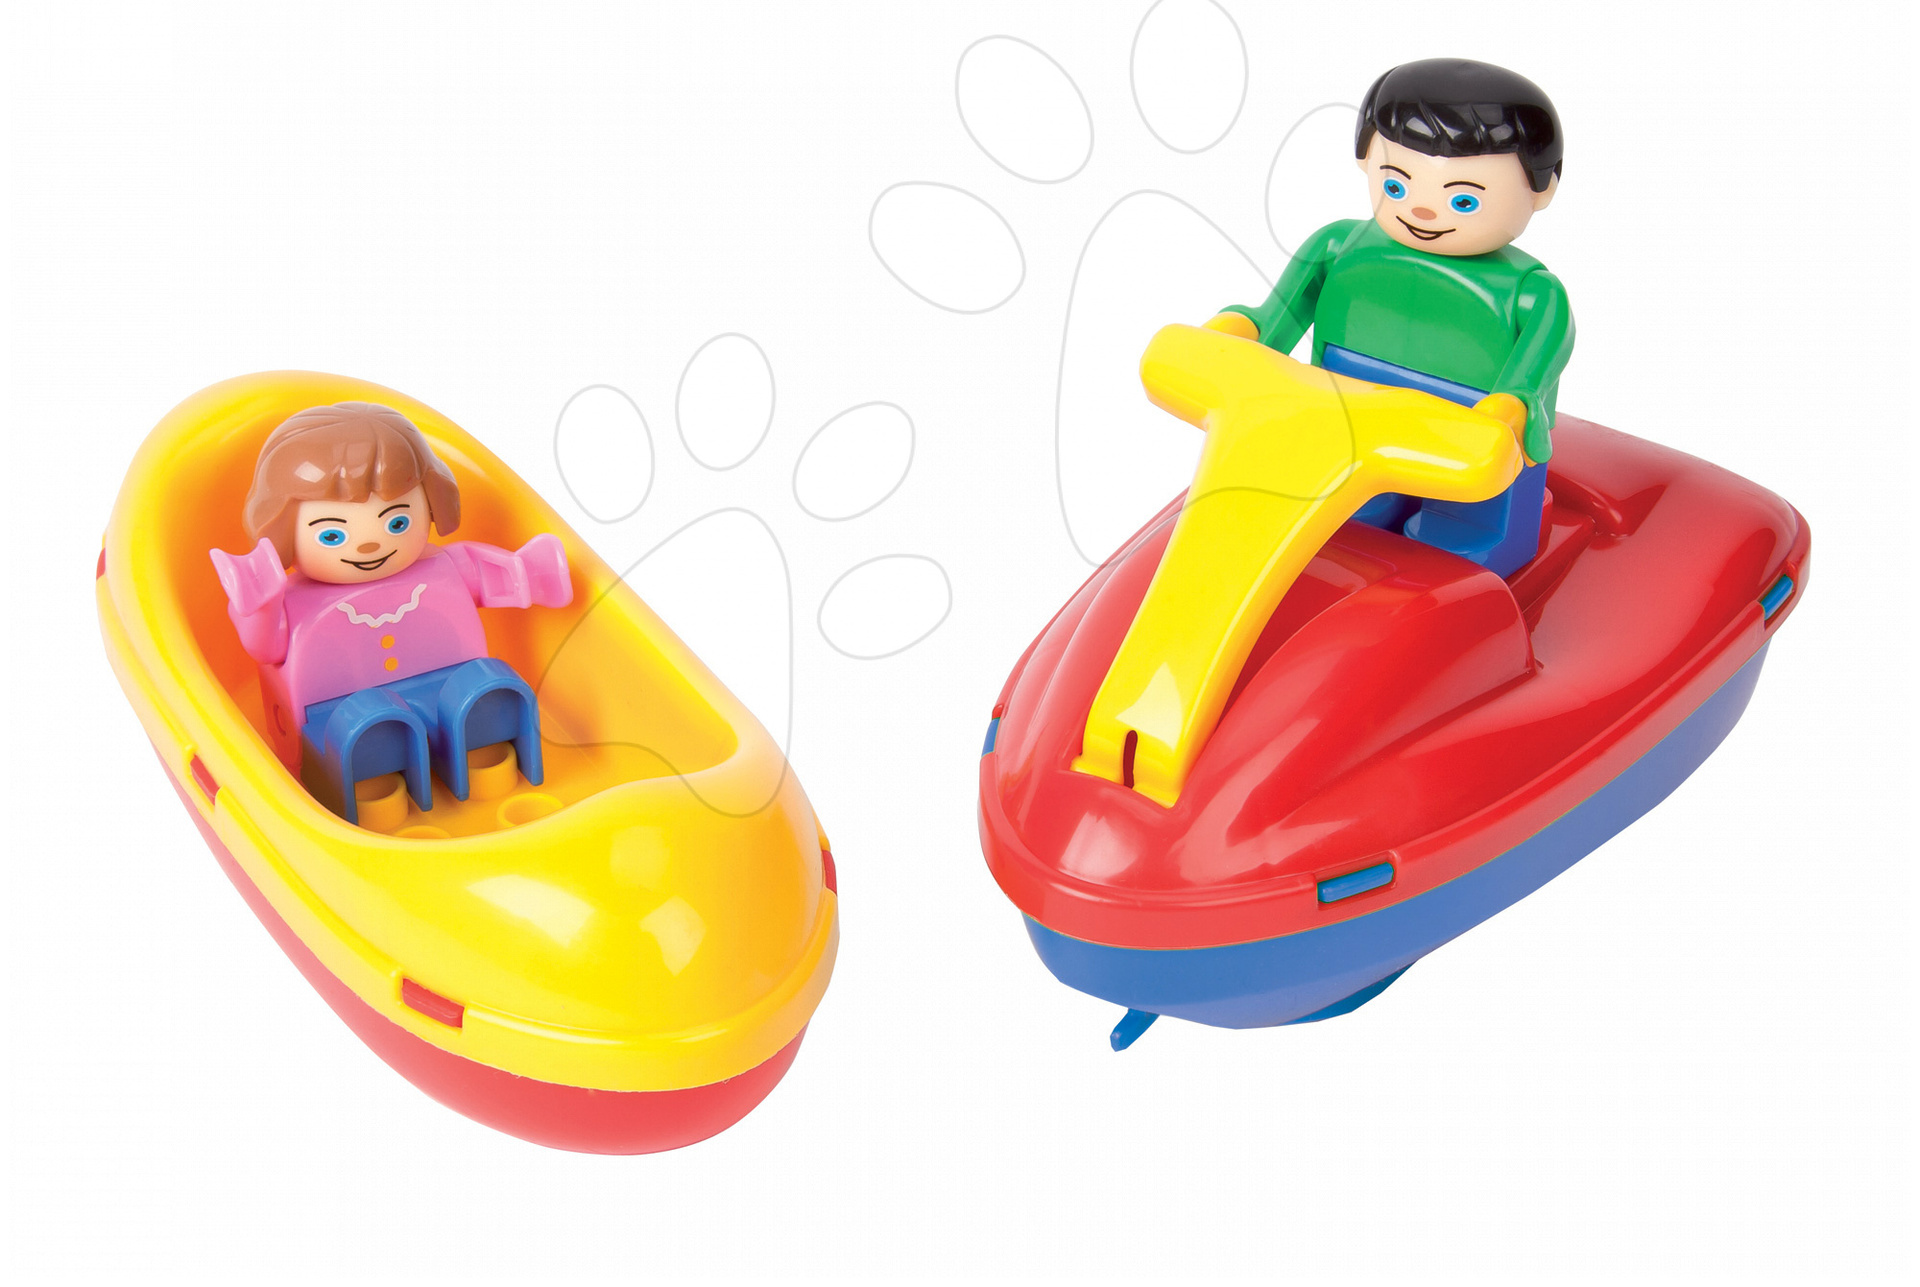 Loďky Waterplay BIG 2 ks výletní barevné s figurkami